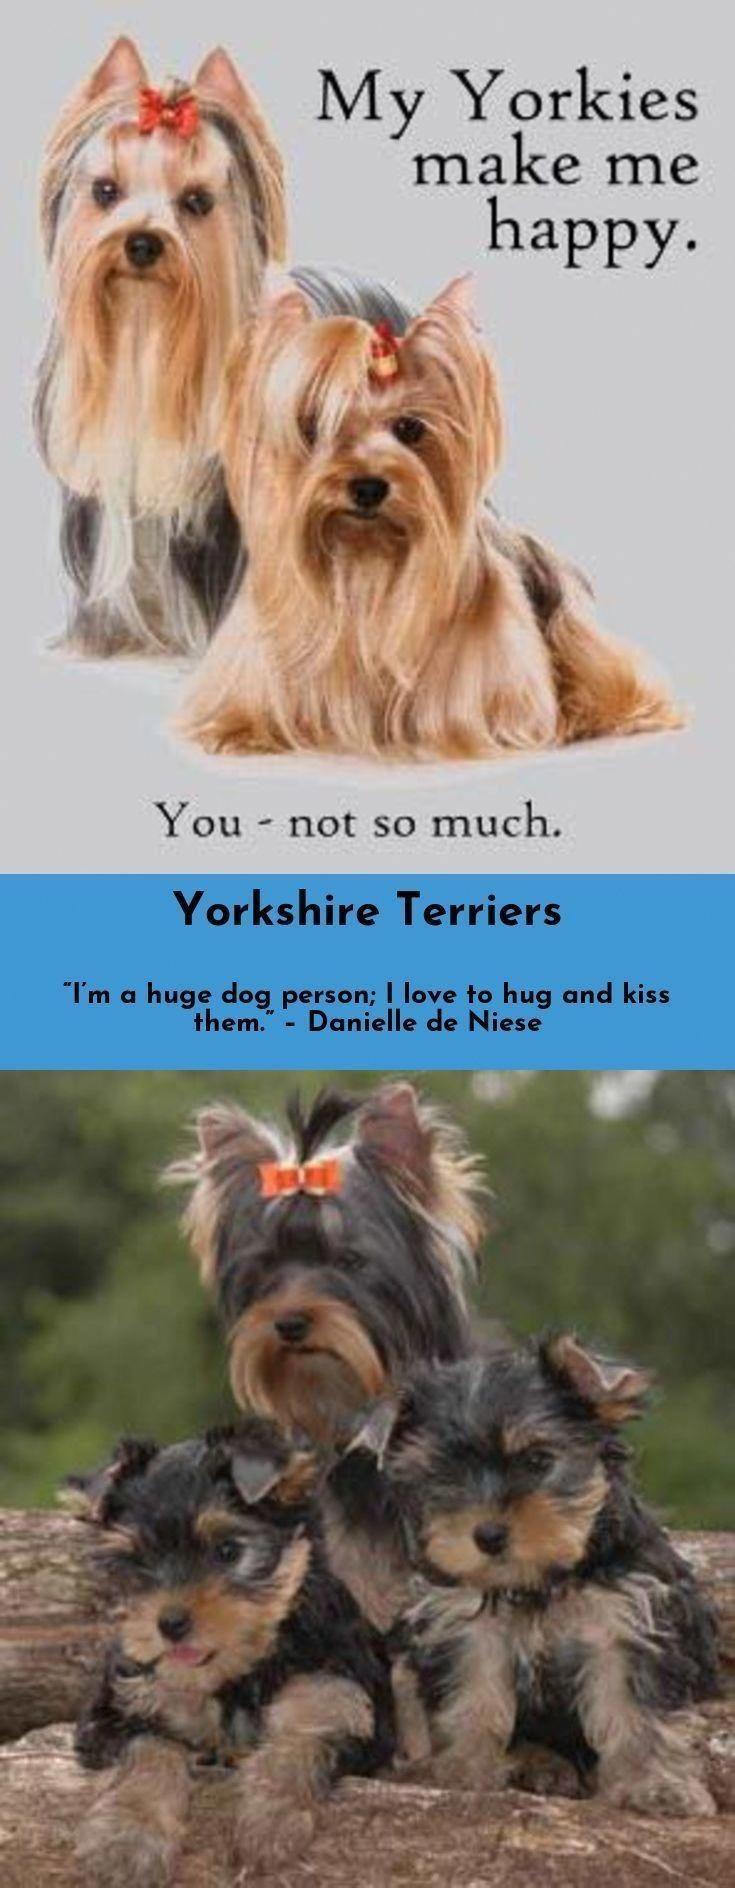 Tumblr In 2020 Dog Training Yorkshire Terrier Positive Dog Training